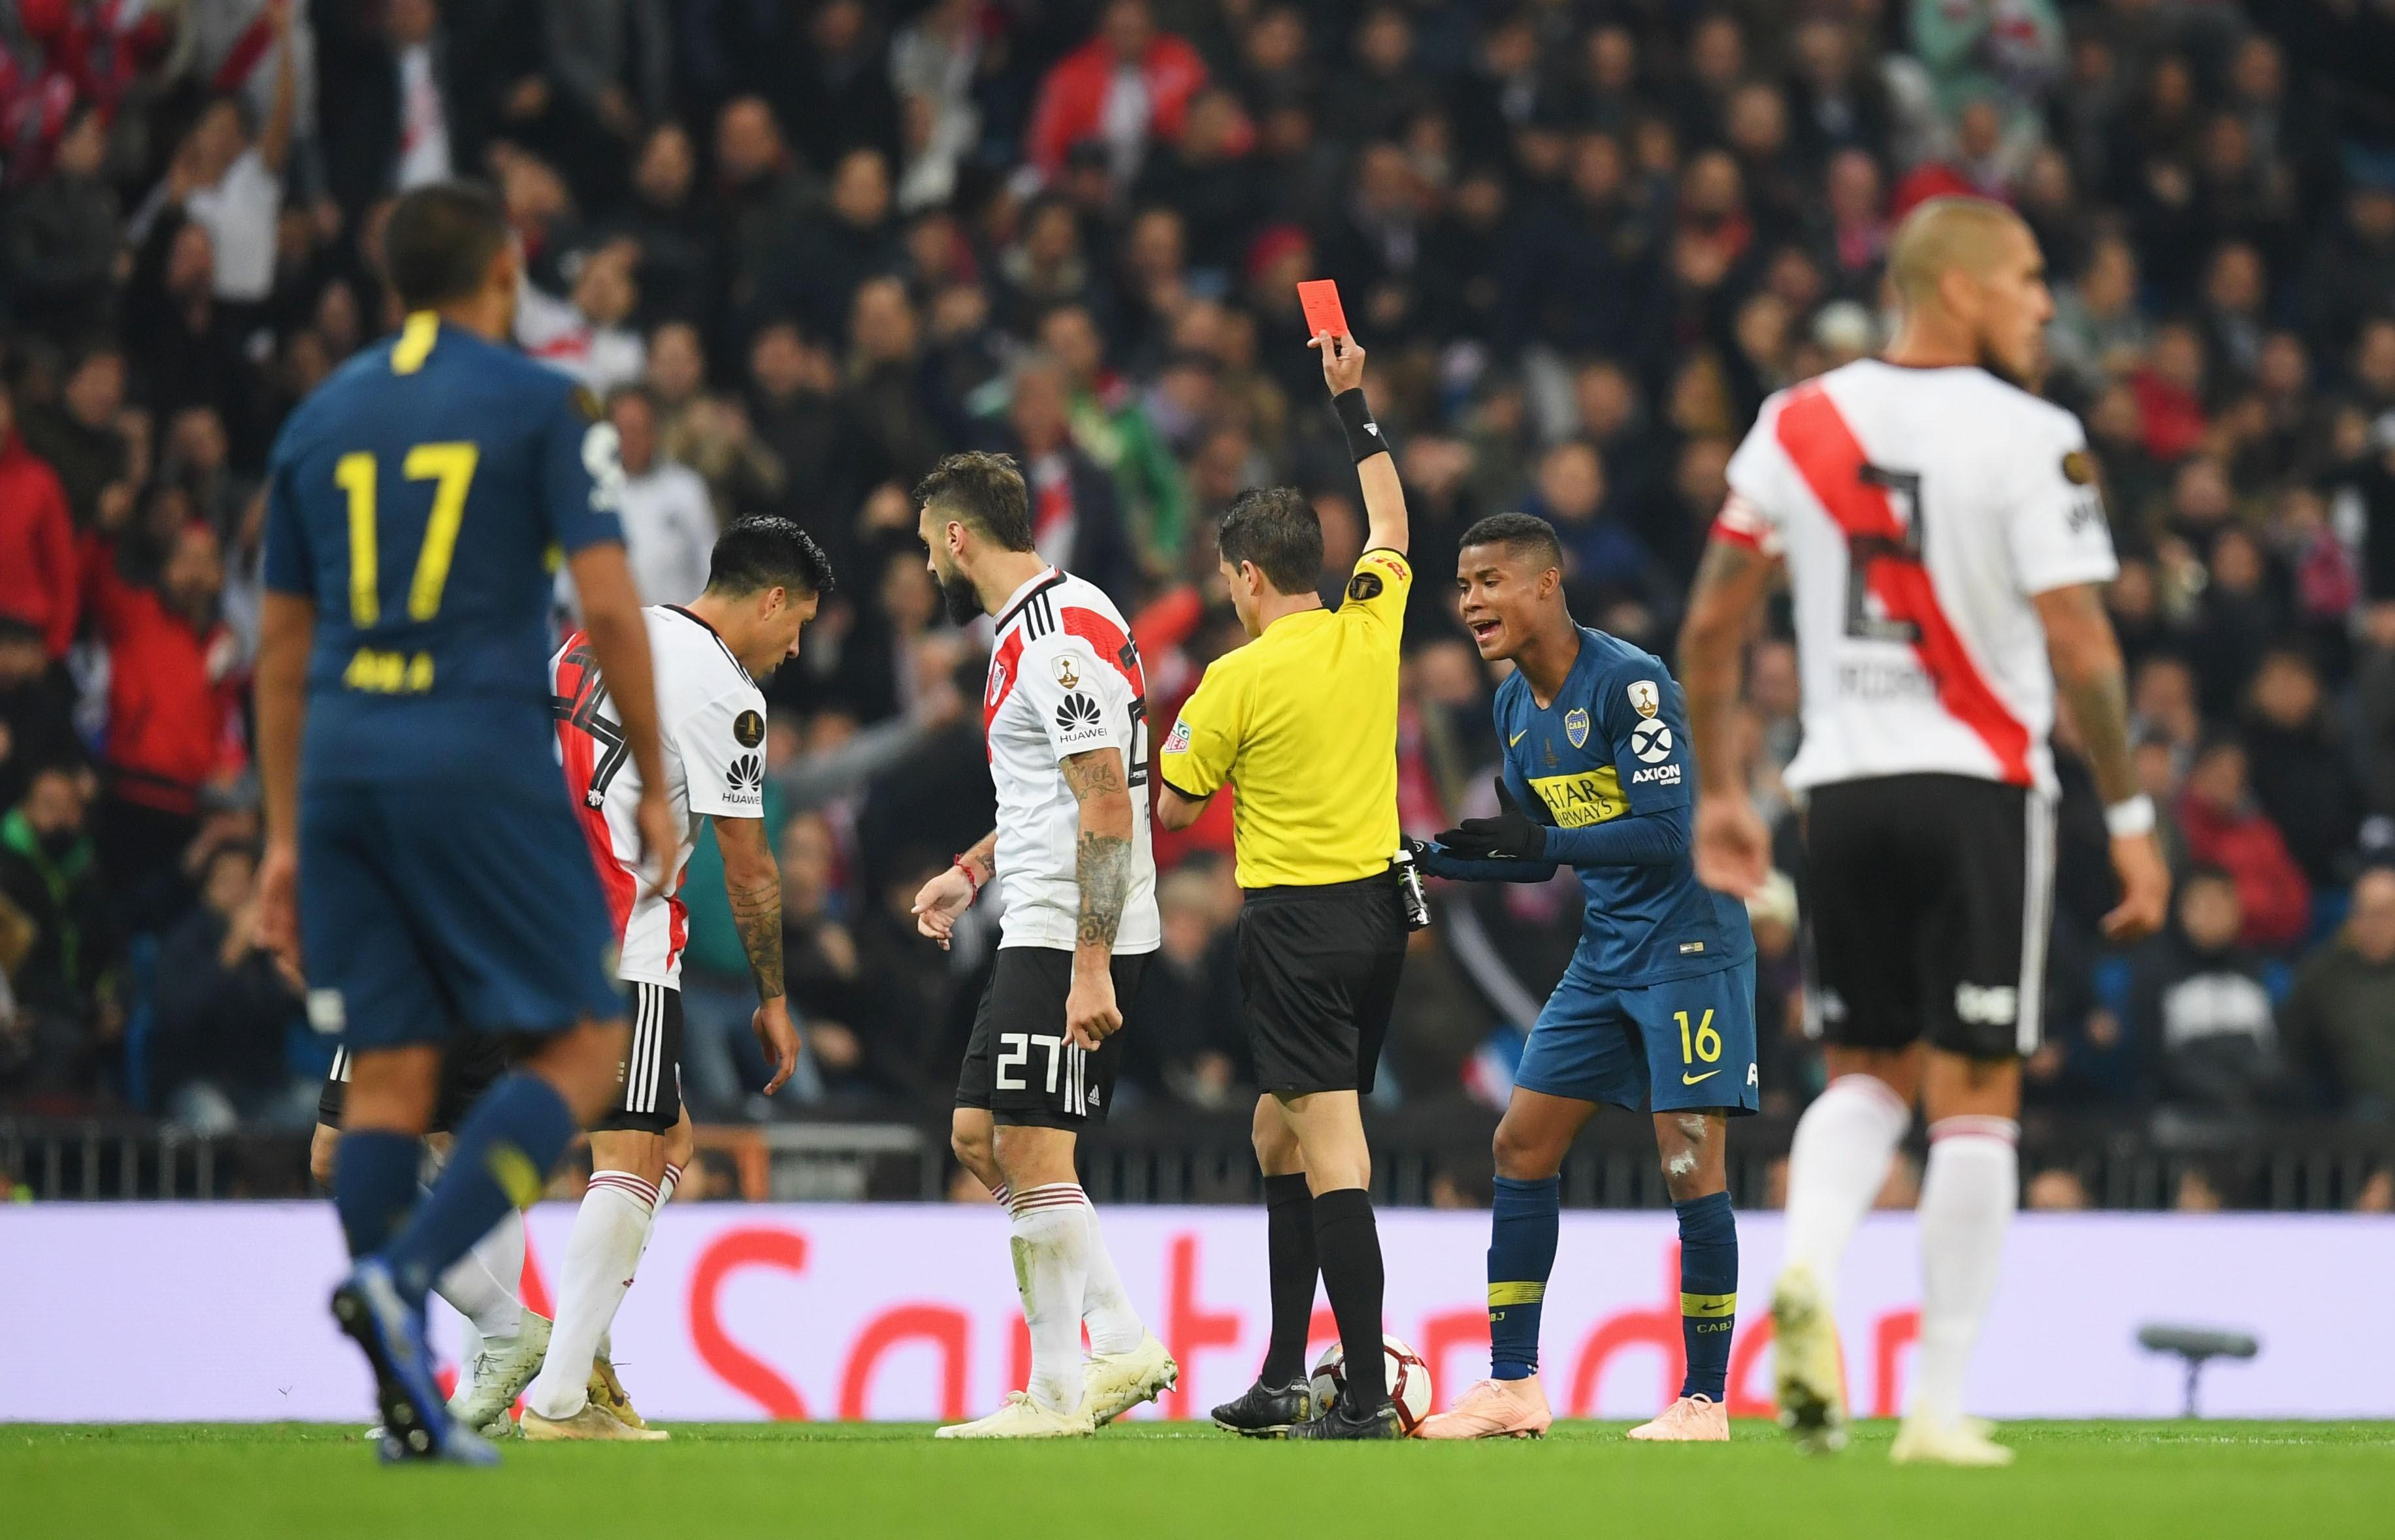 Wilmar Barrios reçoit un carton rouge lors de River Plate-Boca Juniors / Copa Libertadores